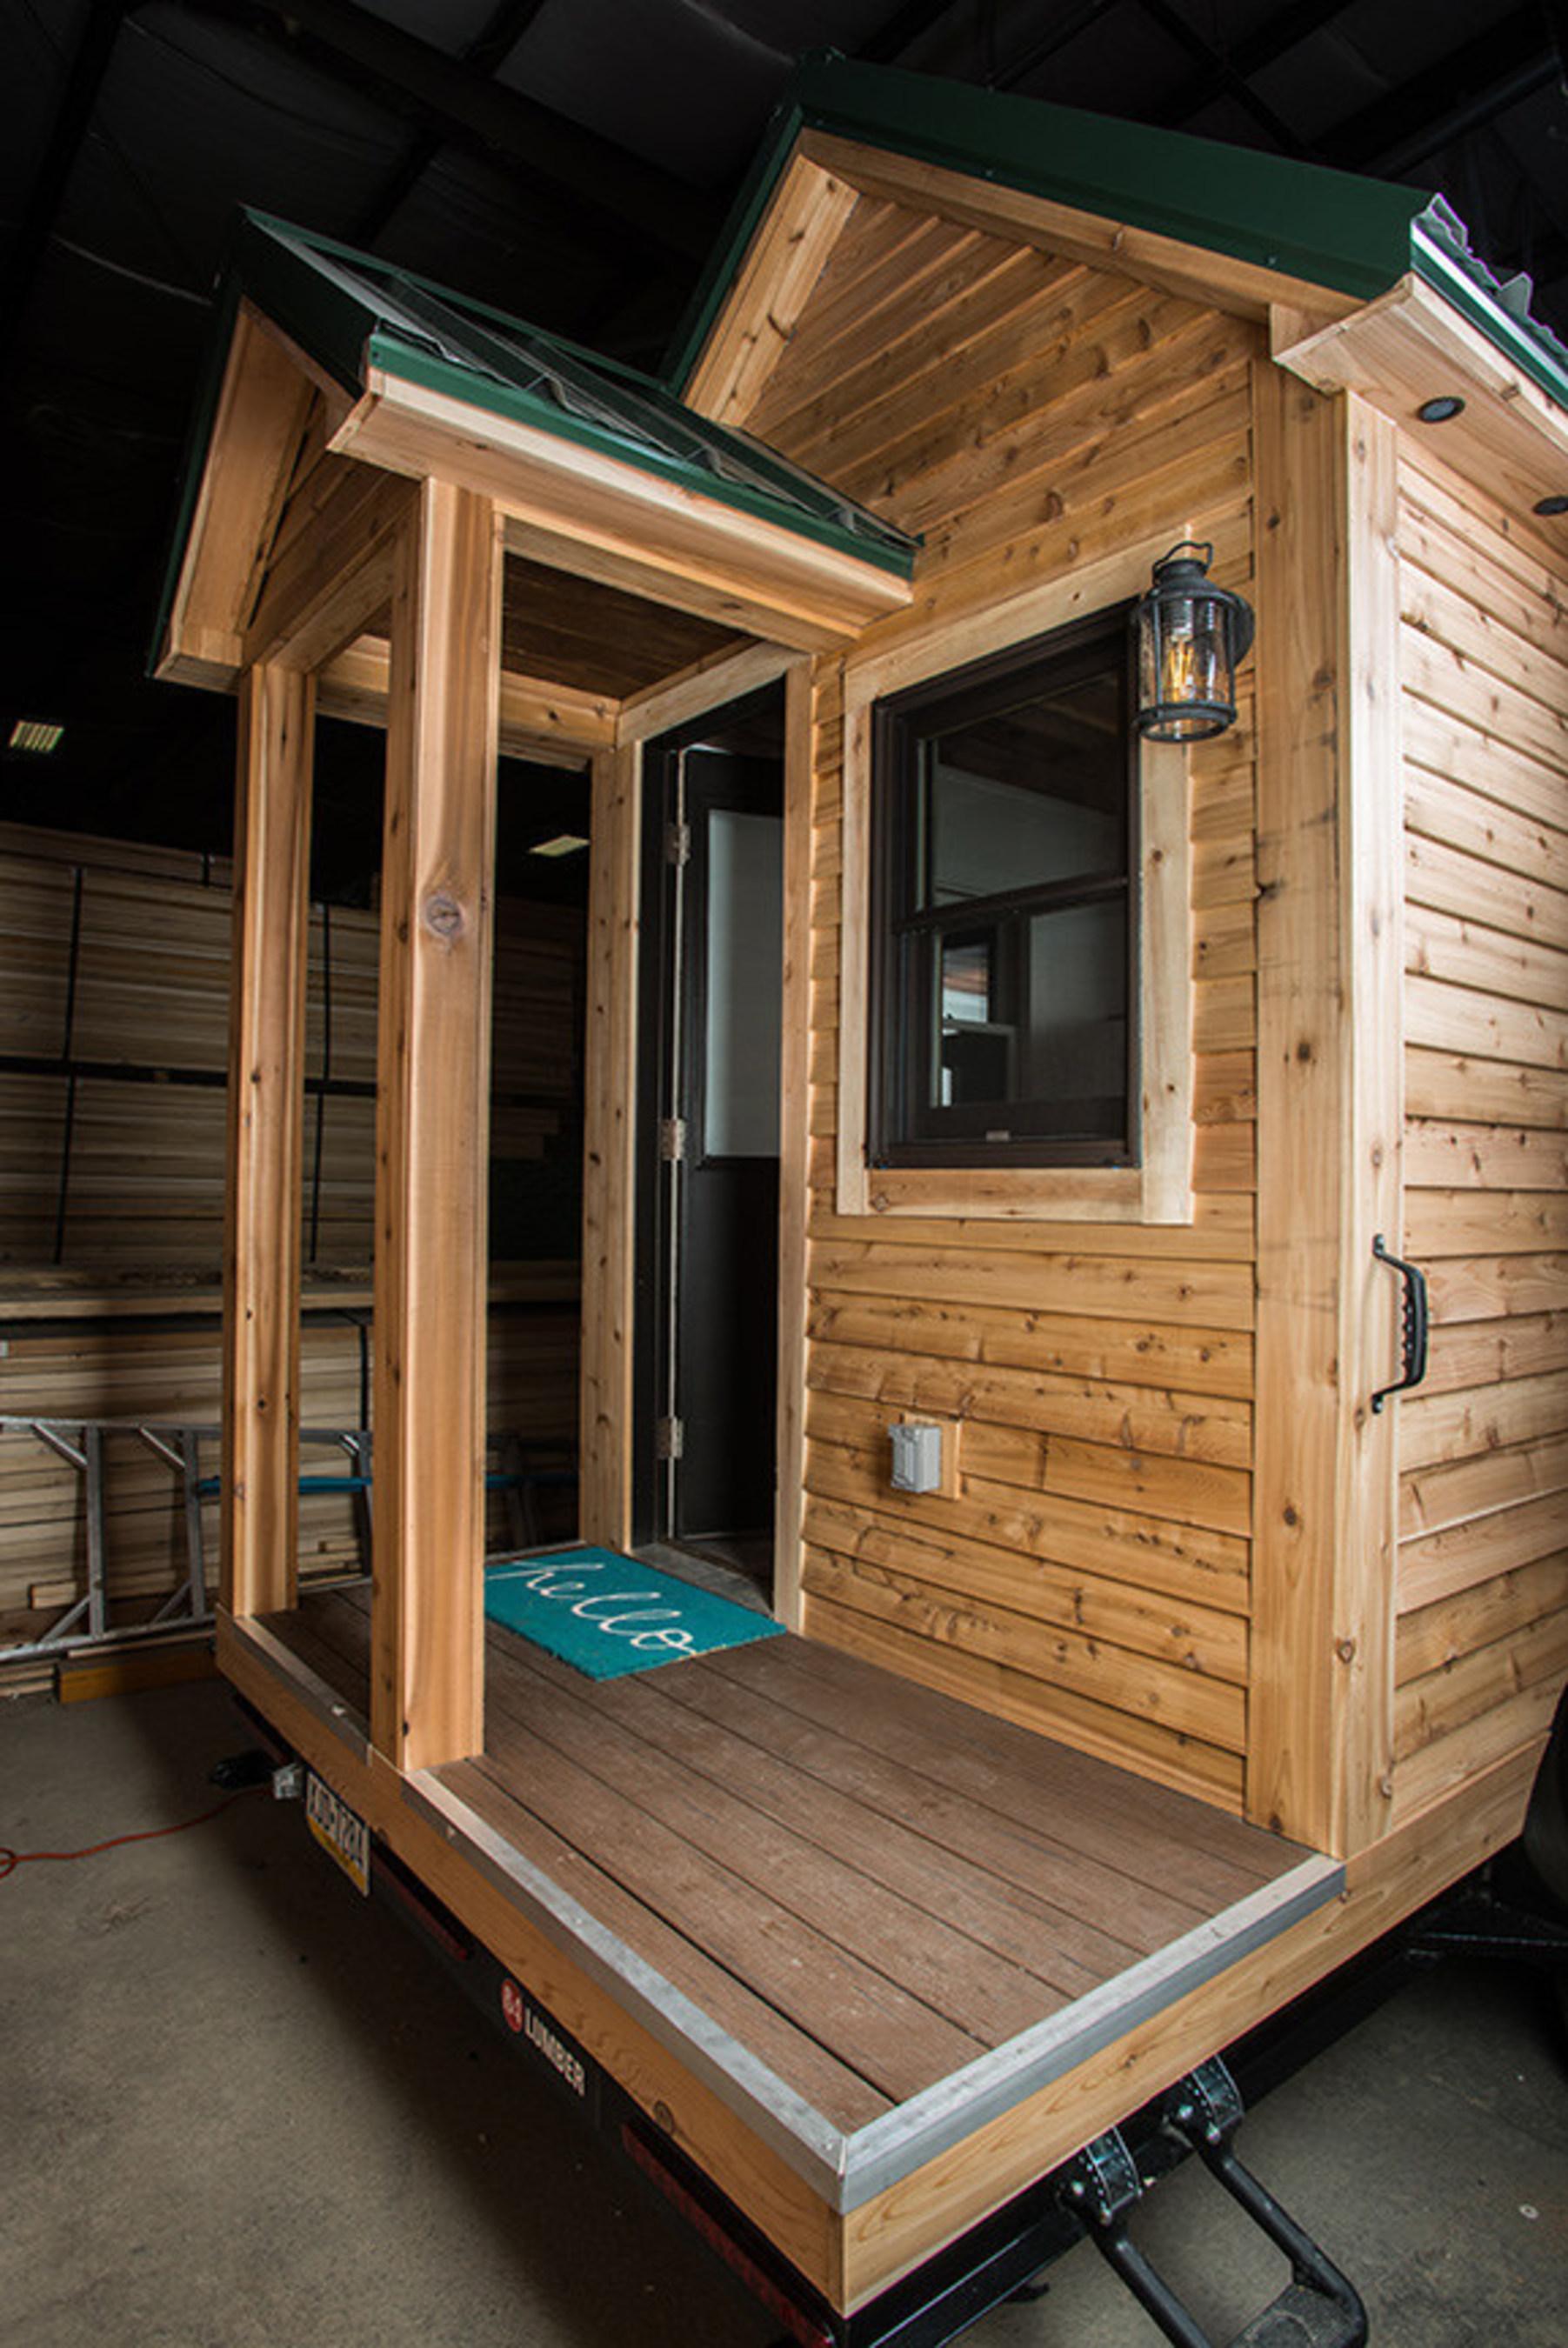 84 Lumber Begins Offering Custom Tiny Homes